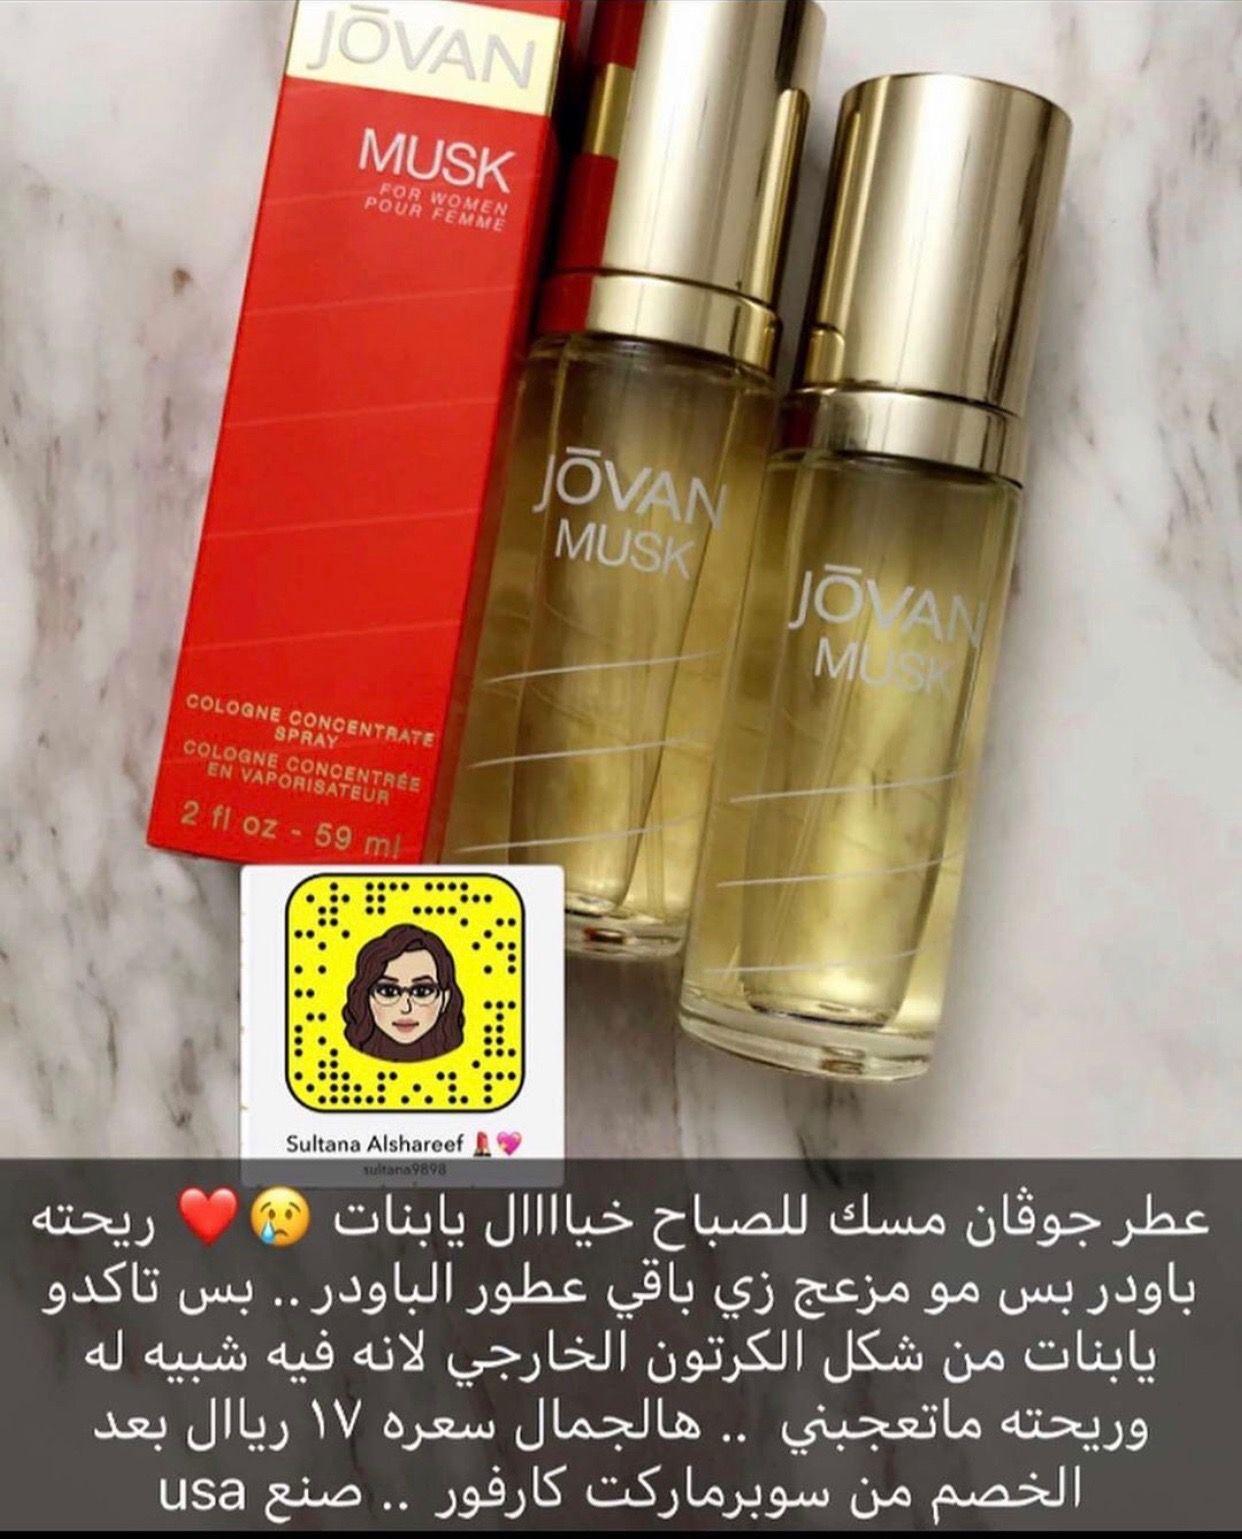 Pin By Najla Ya On عطور Beauty Skin Care Routine Hair Perfume Cologne Spray